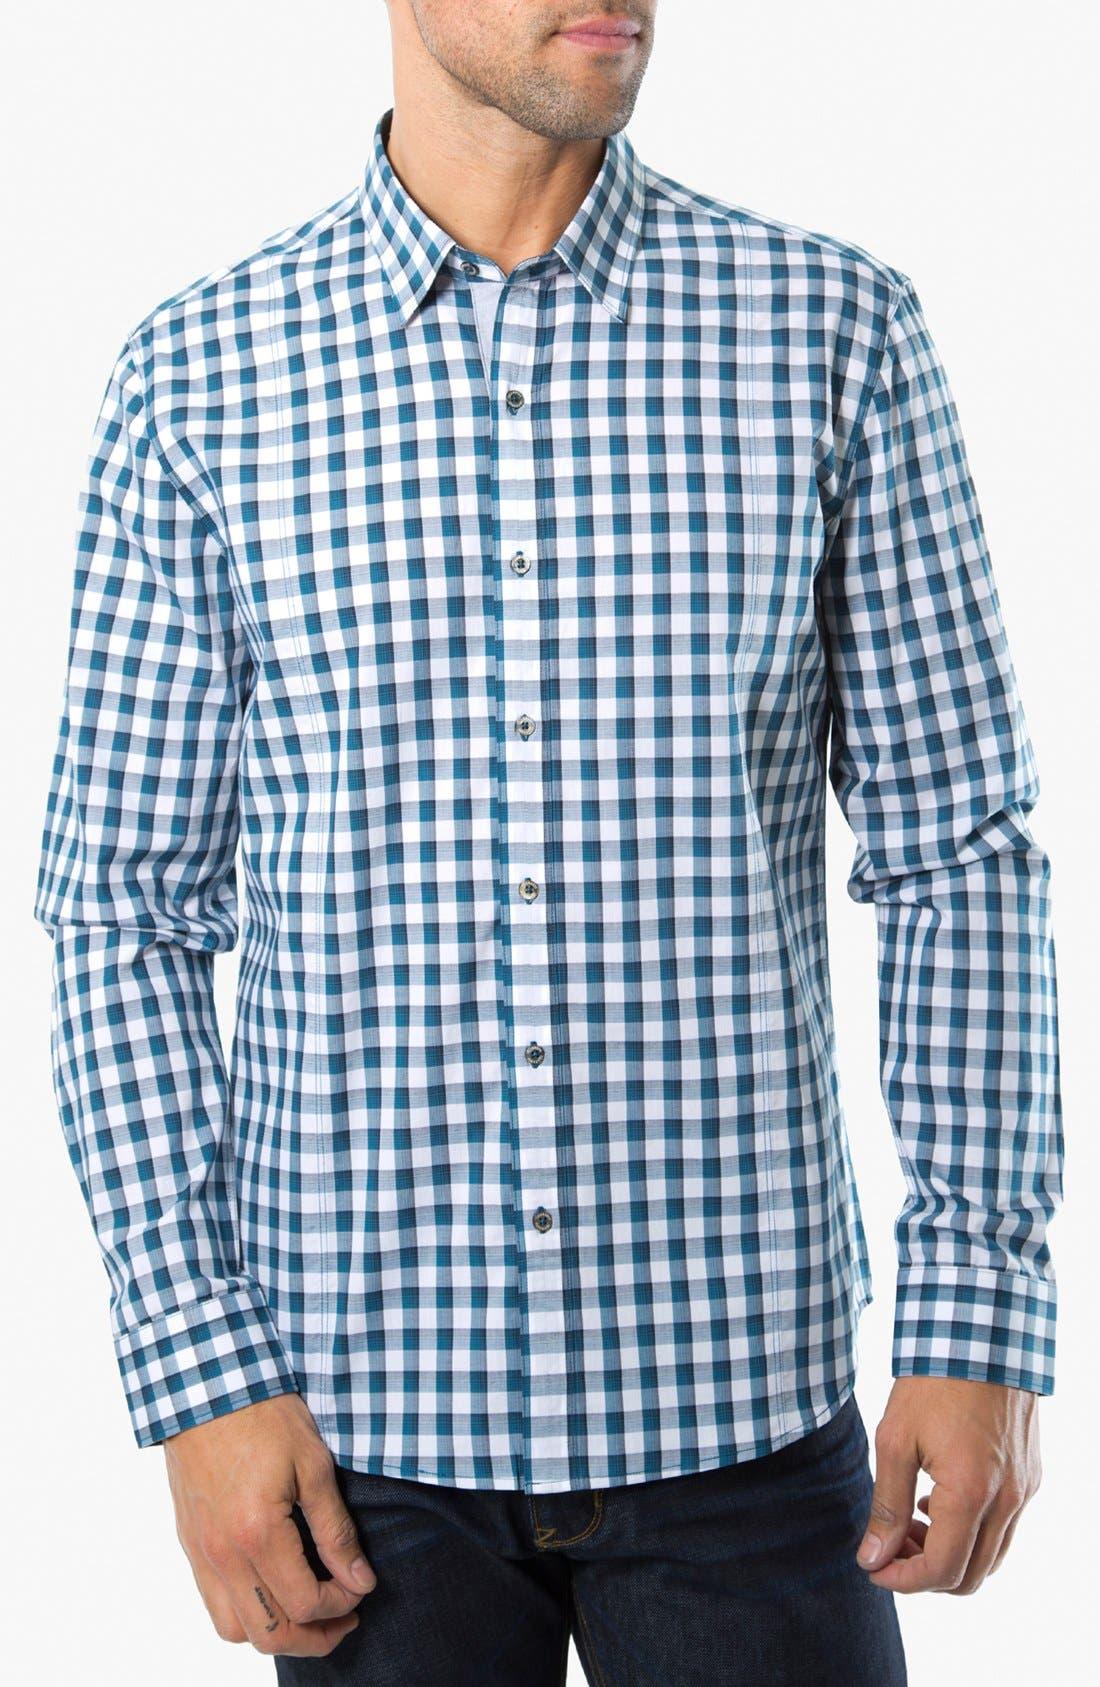 Main Image - 7 Diamonds 'One Day Away' Gingham Trim Fit Cotton Sport Shirt